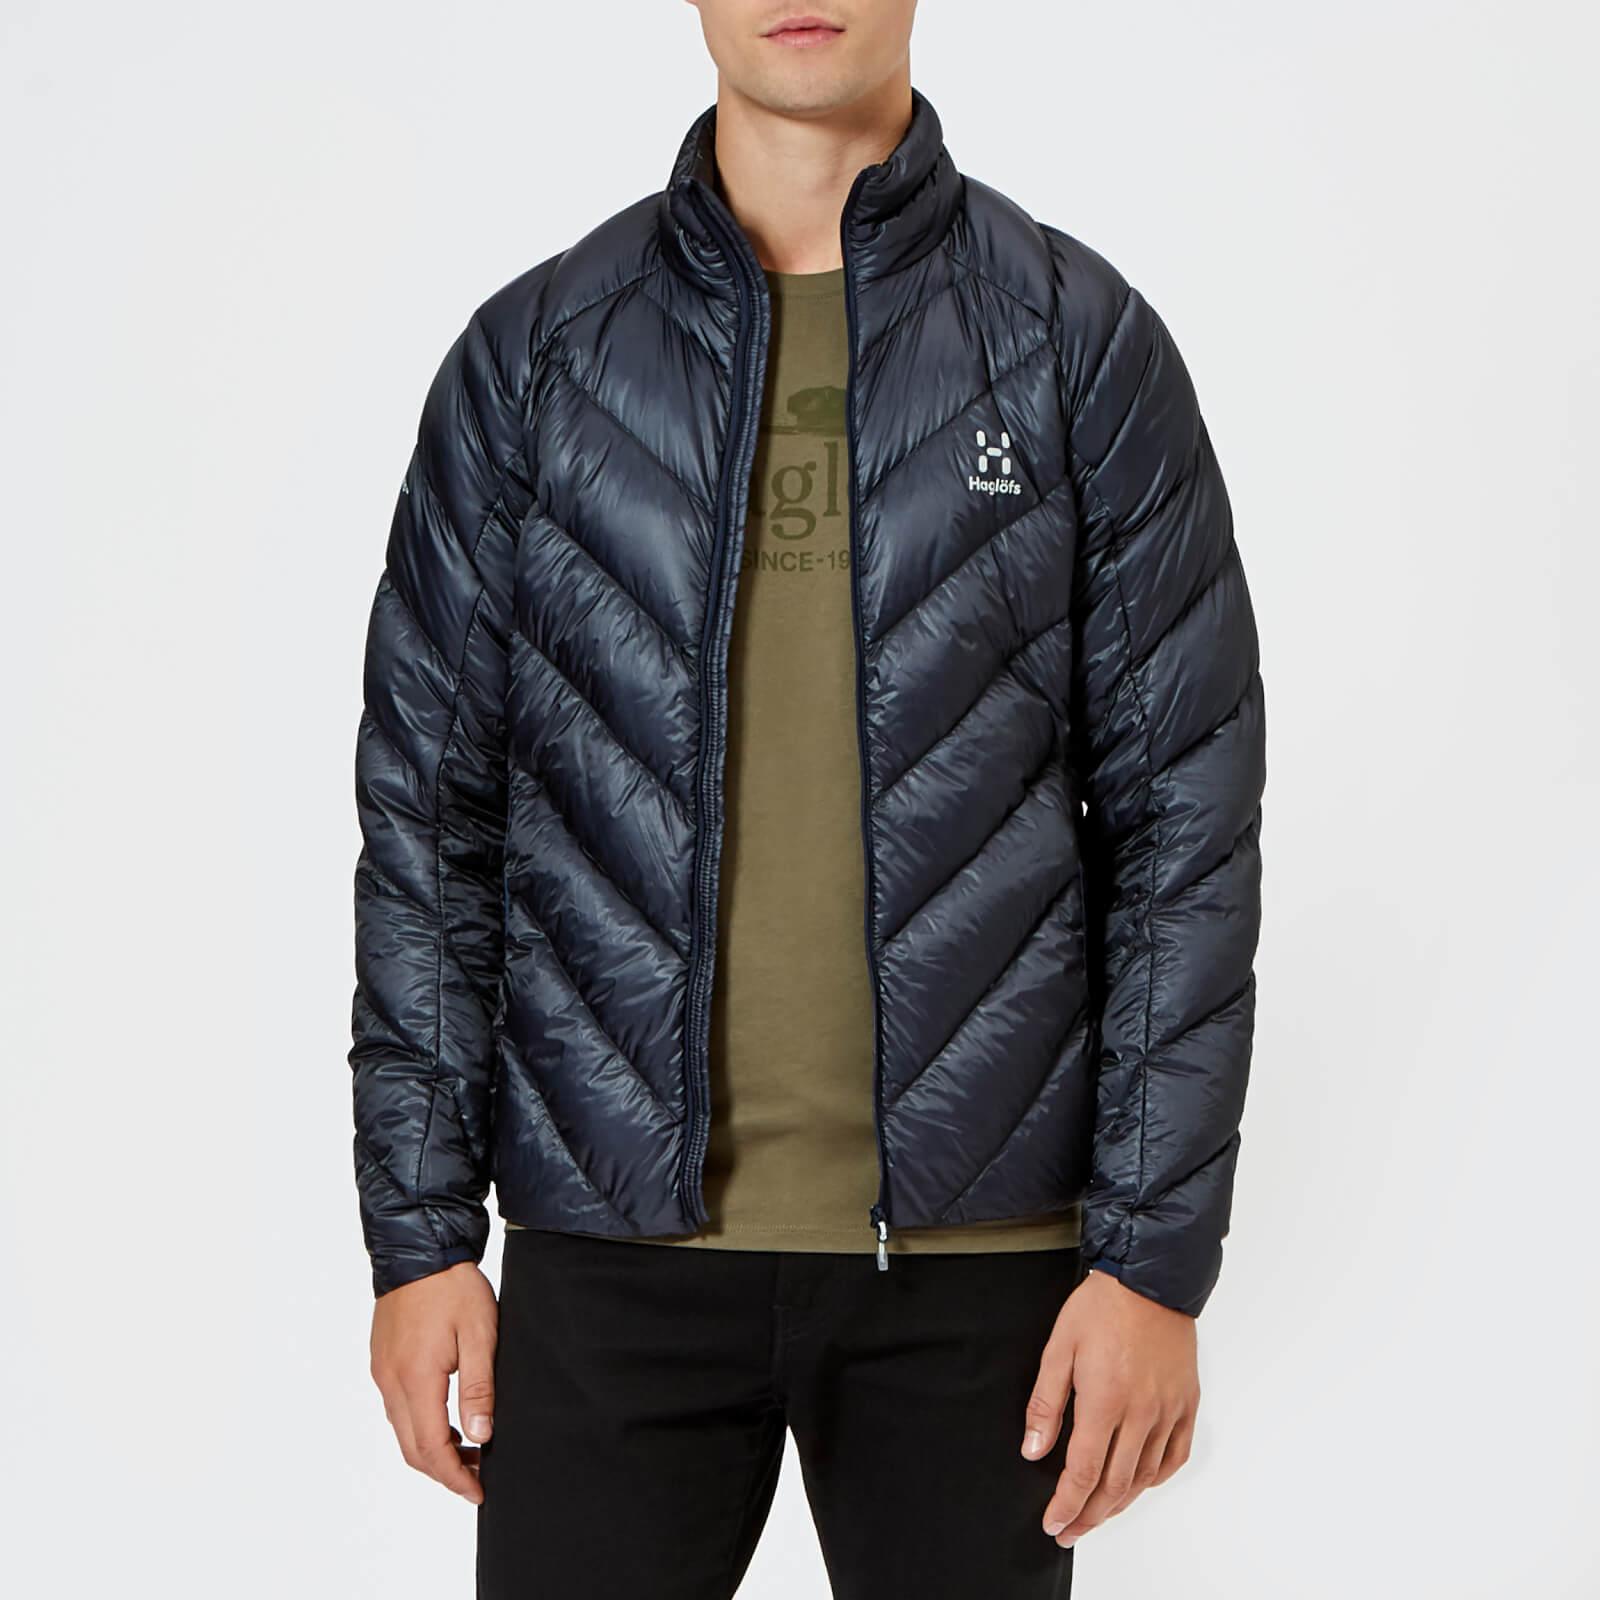 a4be0888 Haglofs Men's L.I.M Essens Jacket - Tarn Blue Clothing | TheHut.com